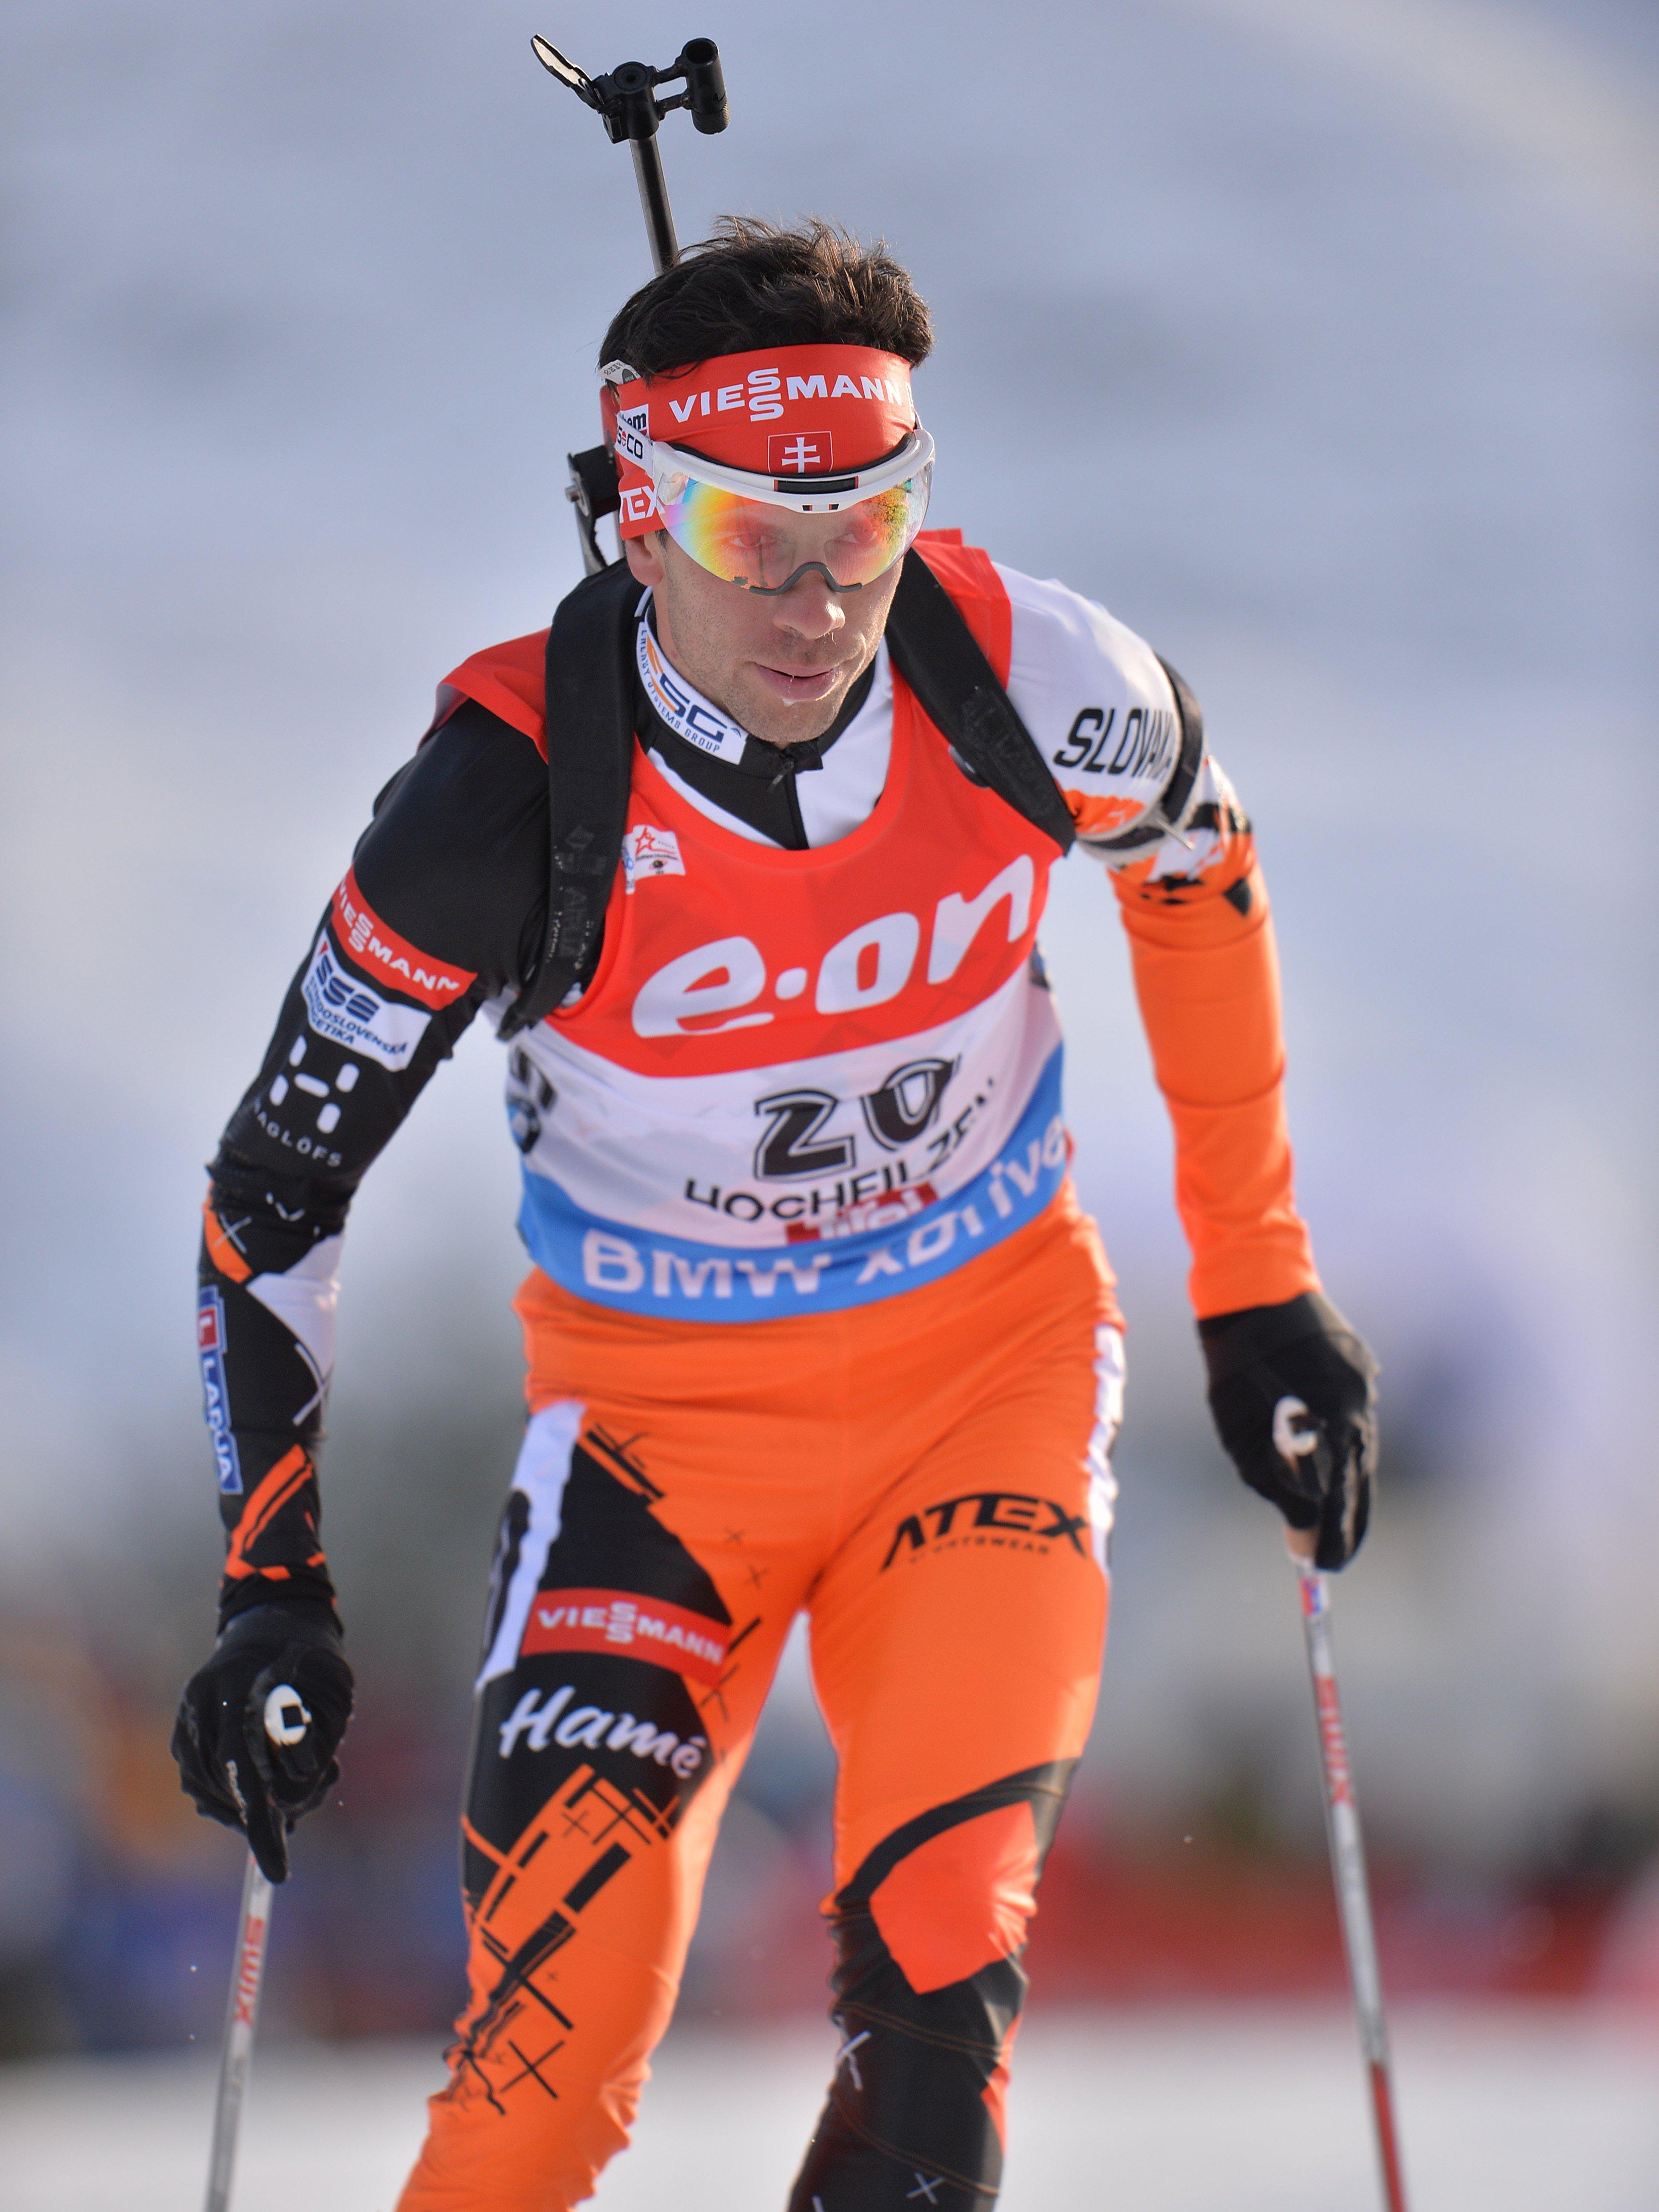 austria_biathlon_world_cup466438208976_r1161.jpg